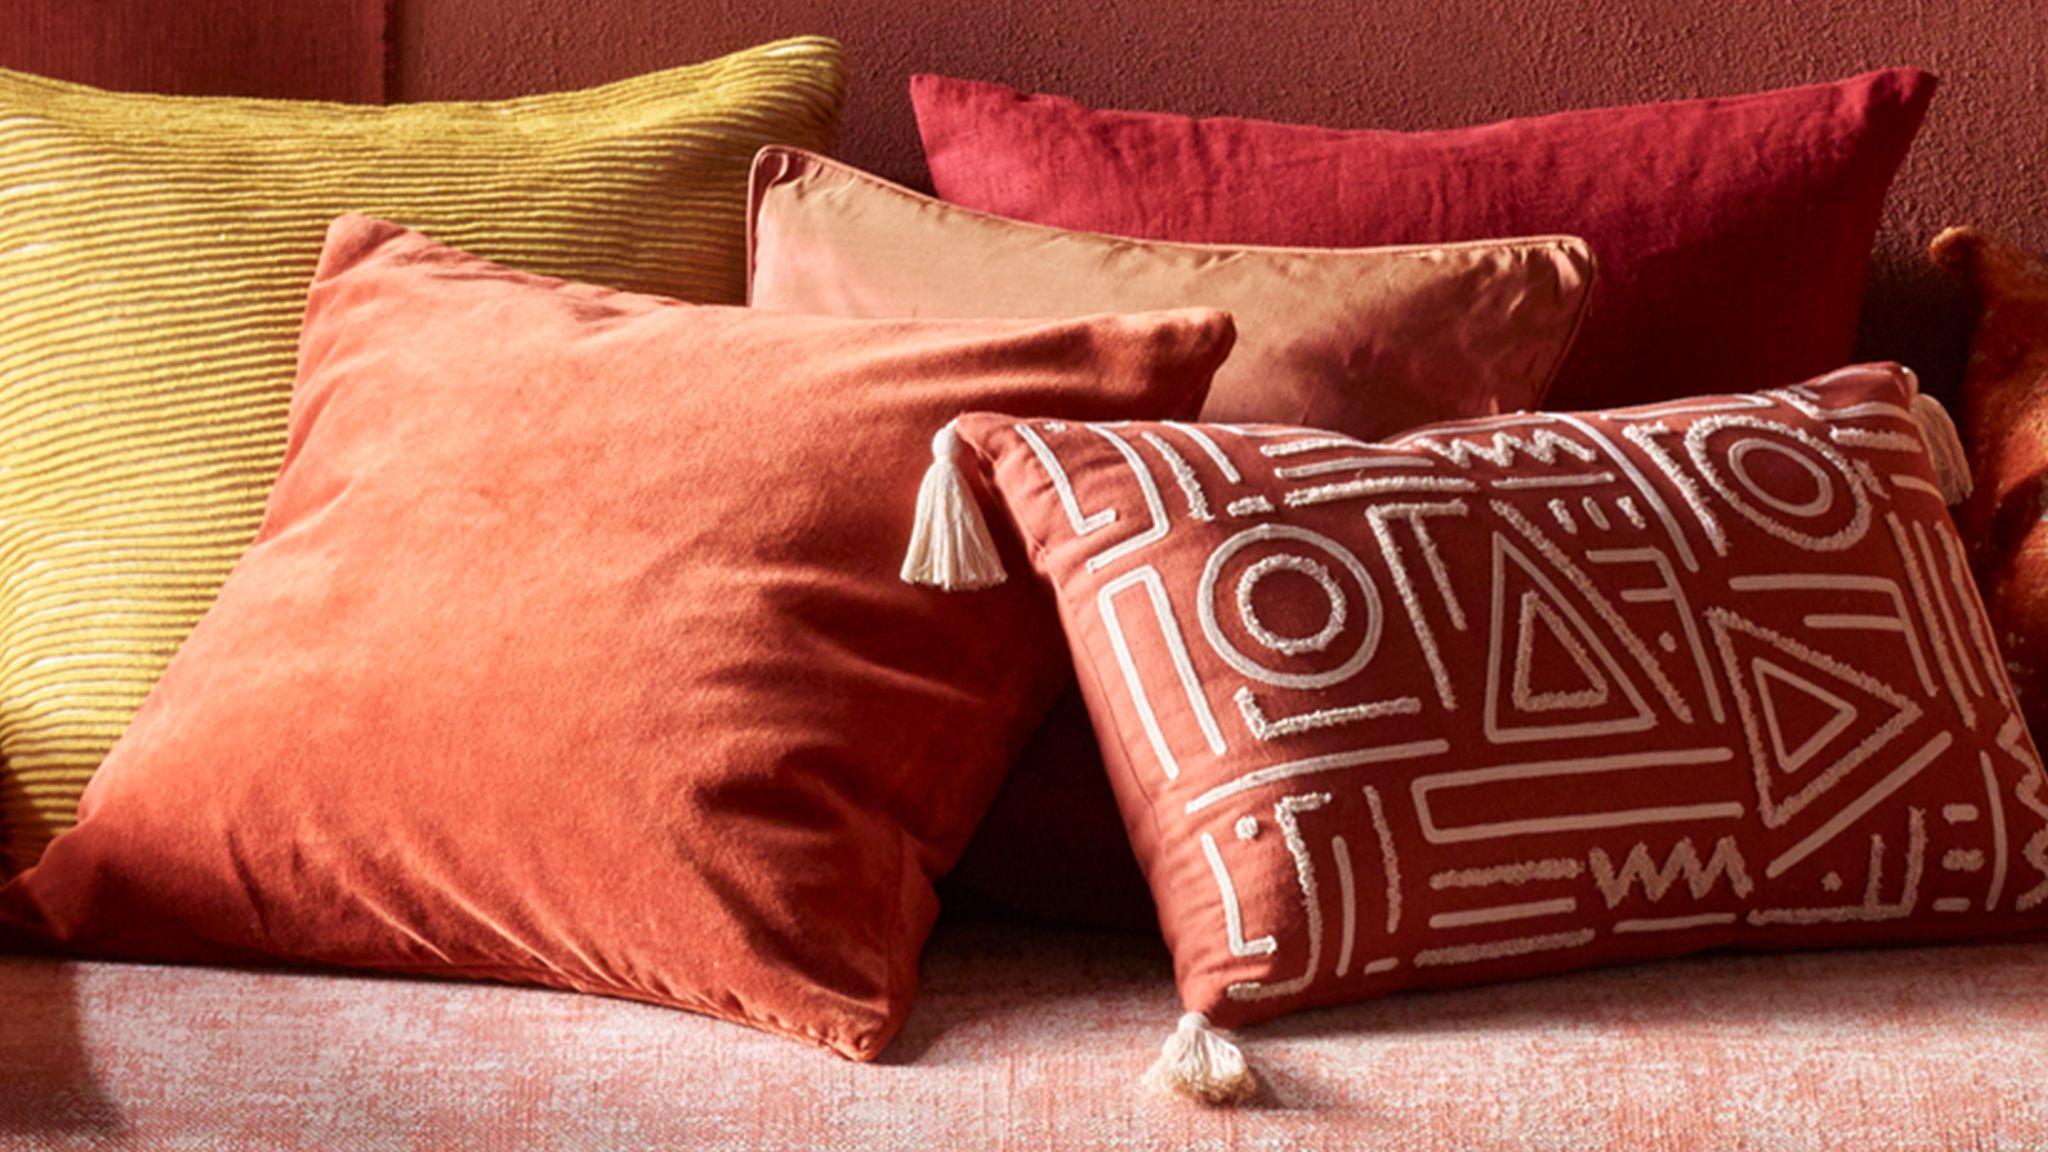 e1700d73f3 New season cushions